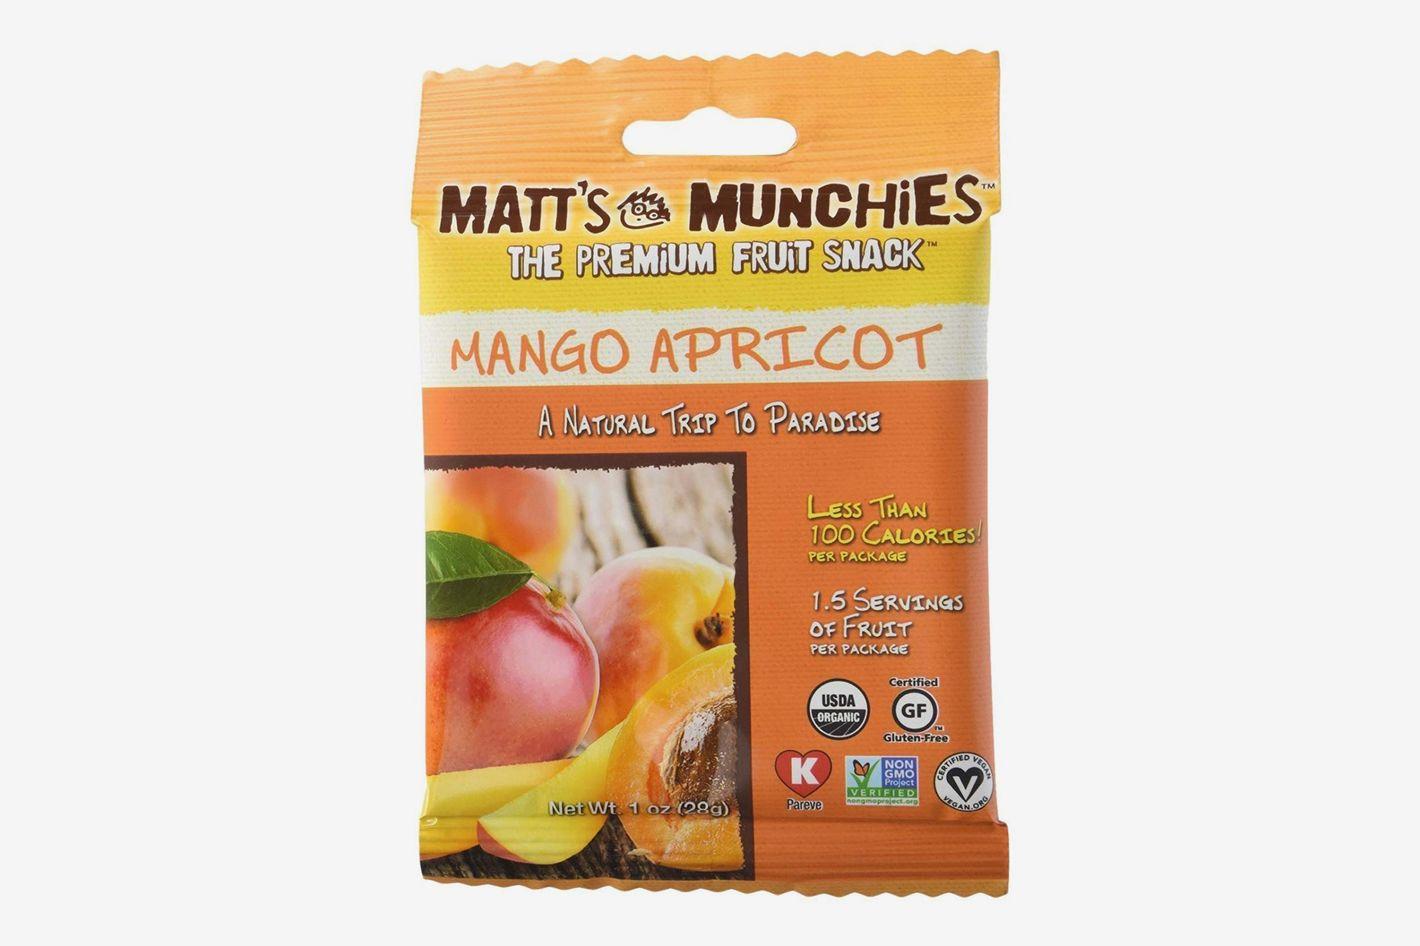 Matt's Munchies Organic Fruit Snack (1-Ounce Bag)